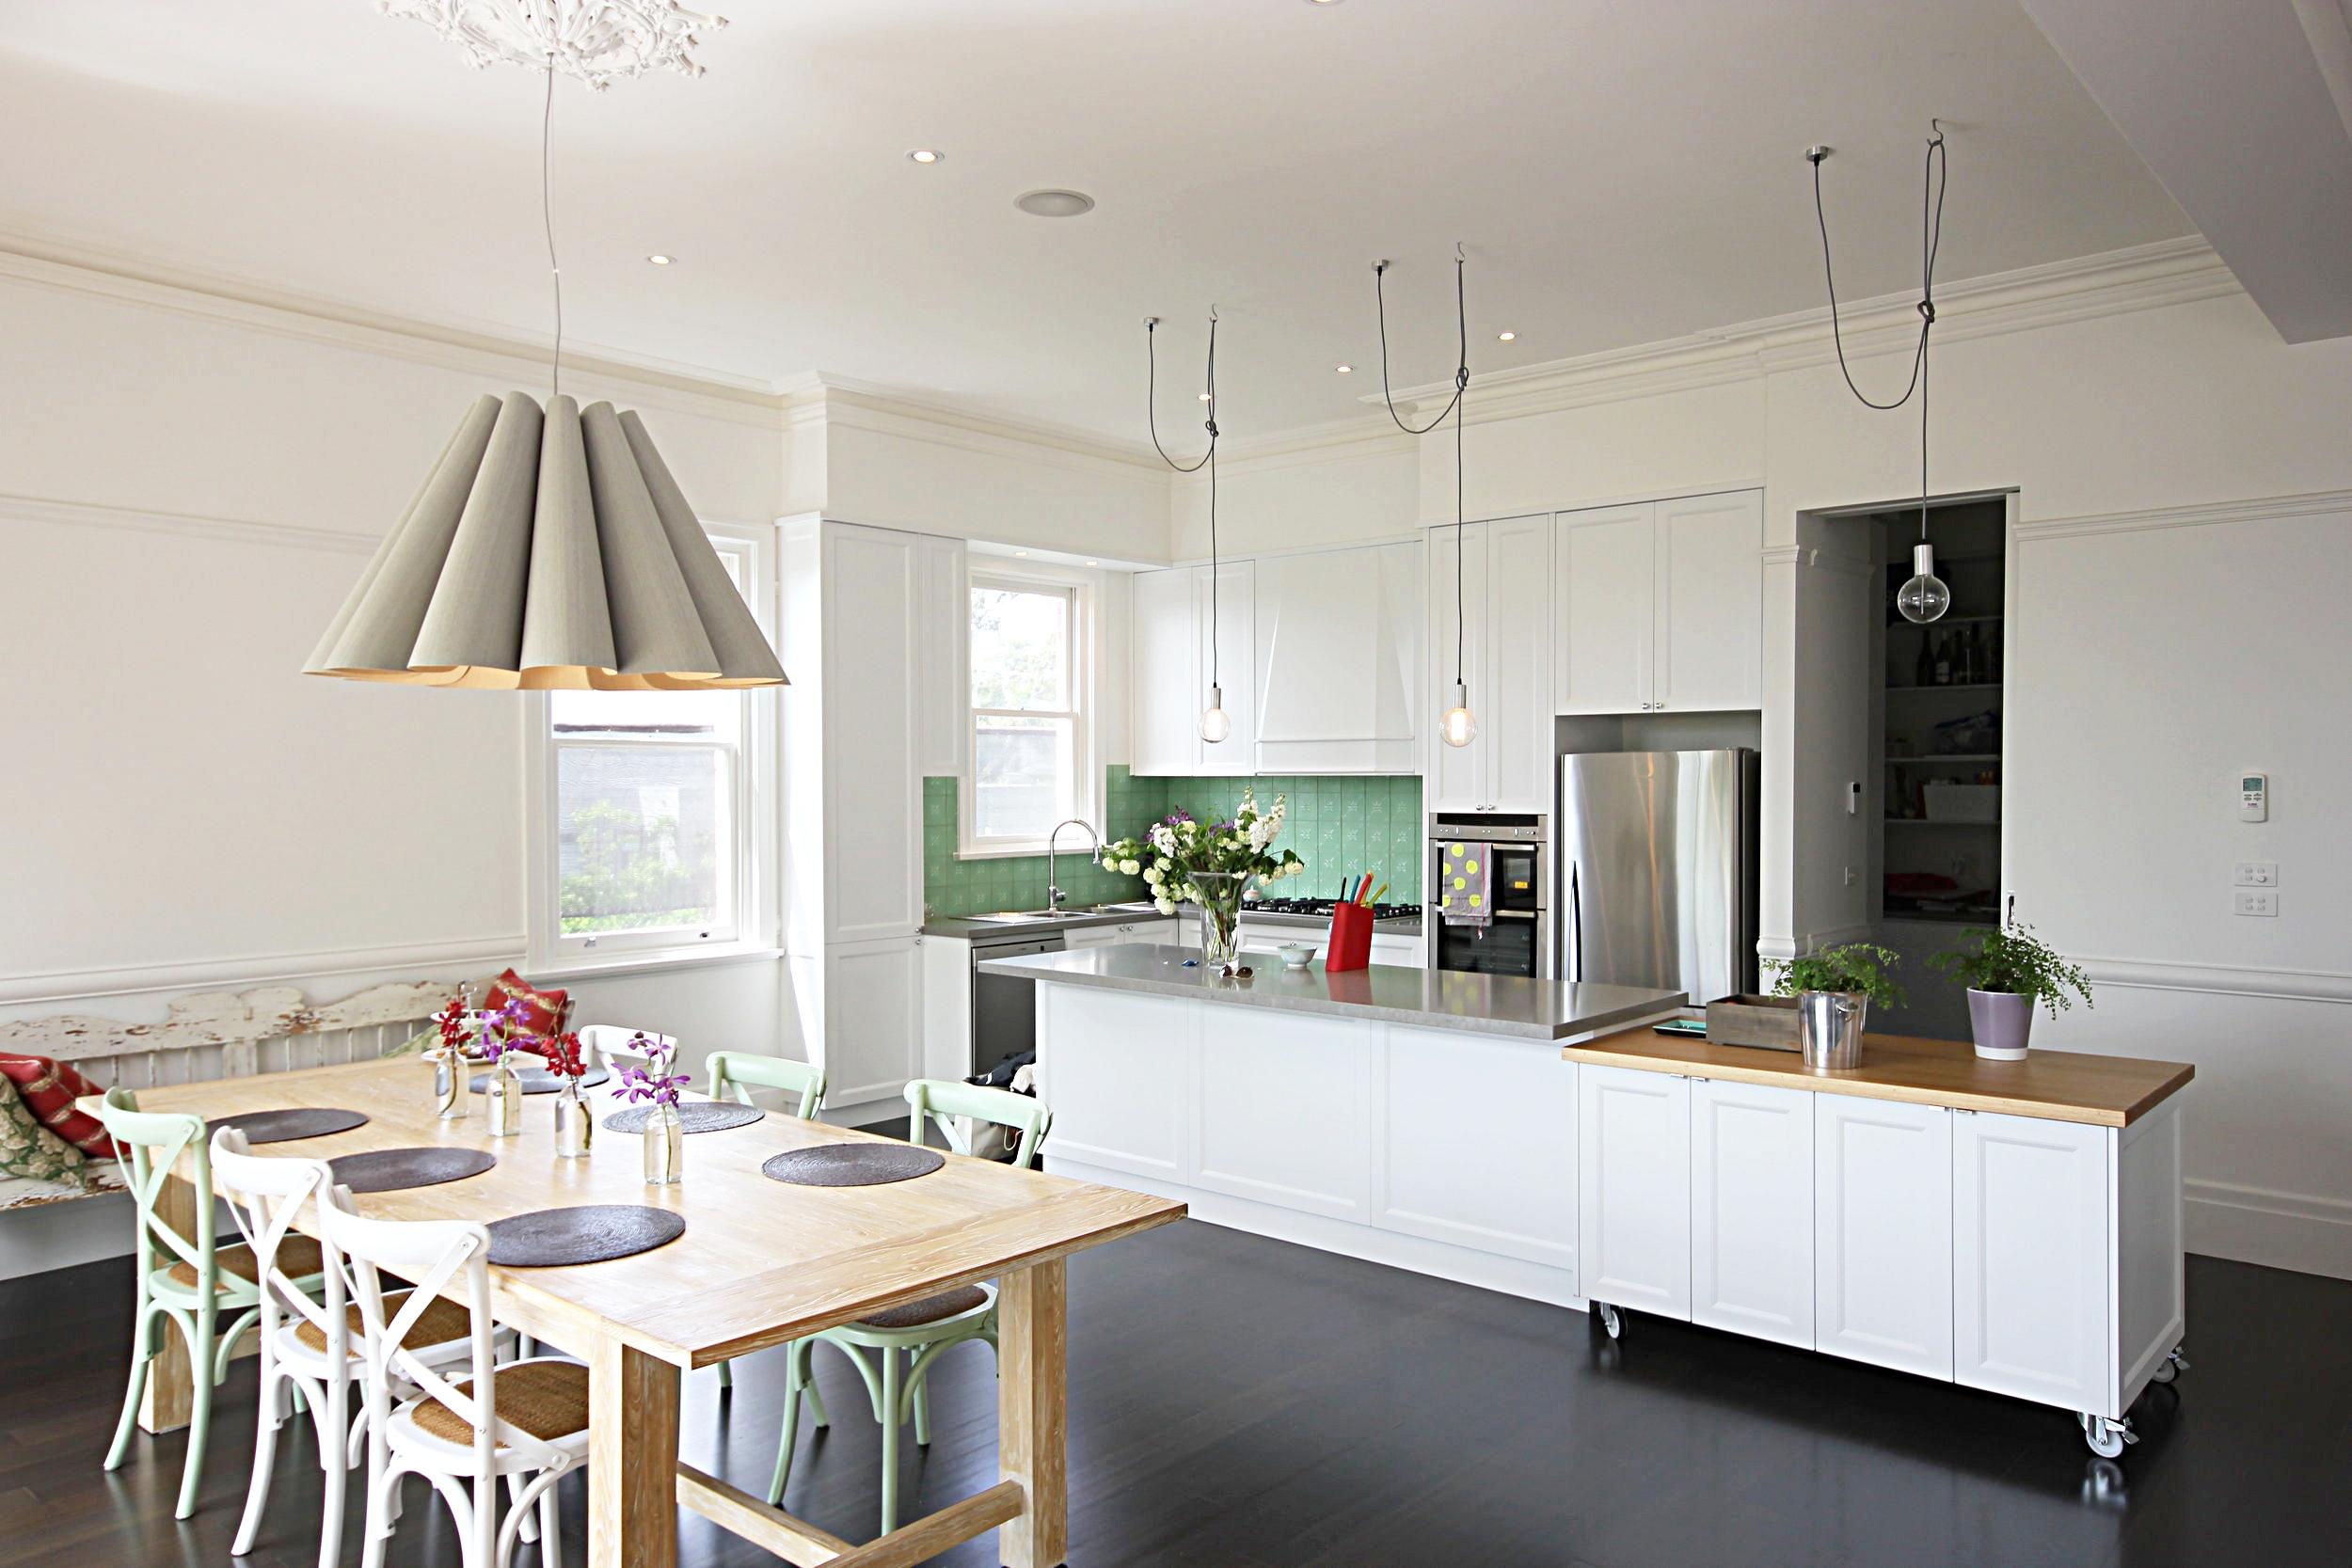 edwardian+queen+anne+villa+renovation+blue+fruit+design.jpeg